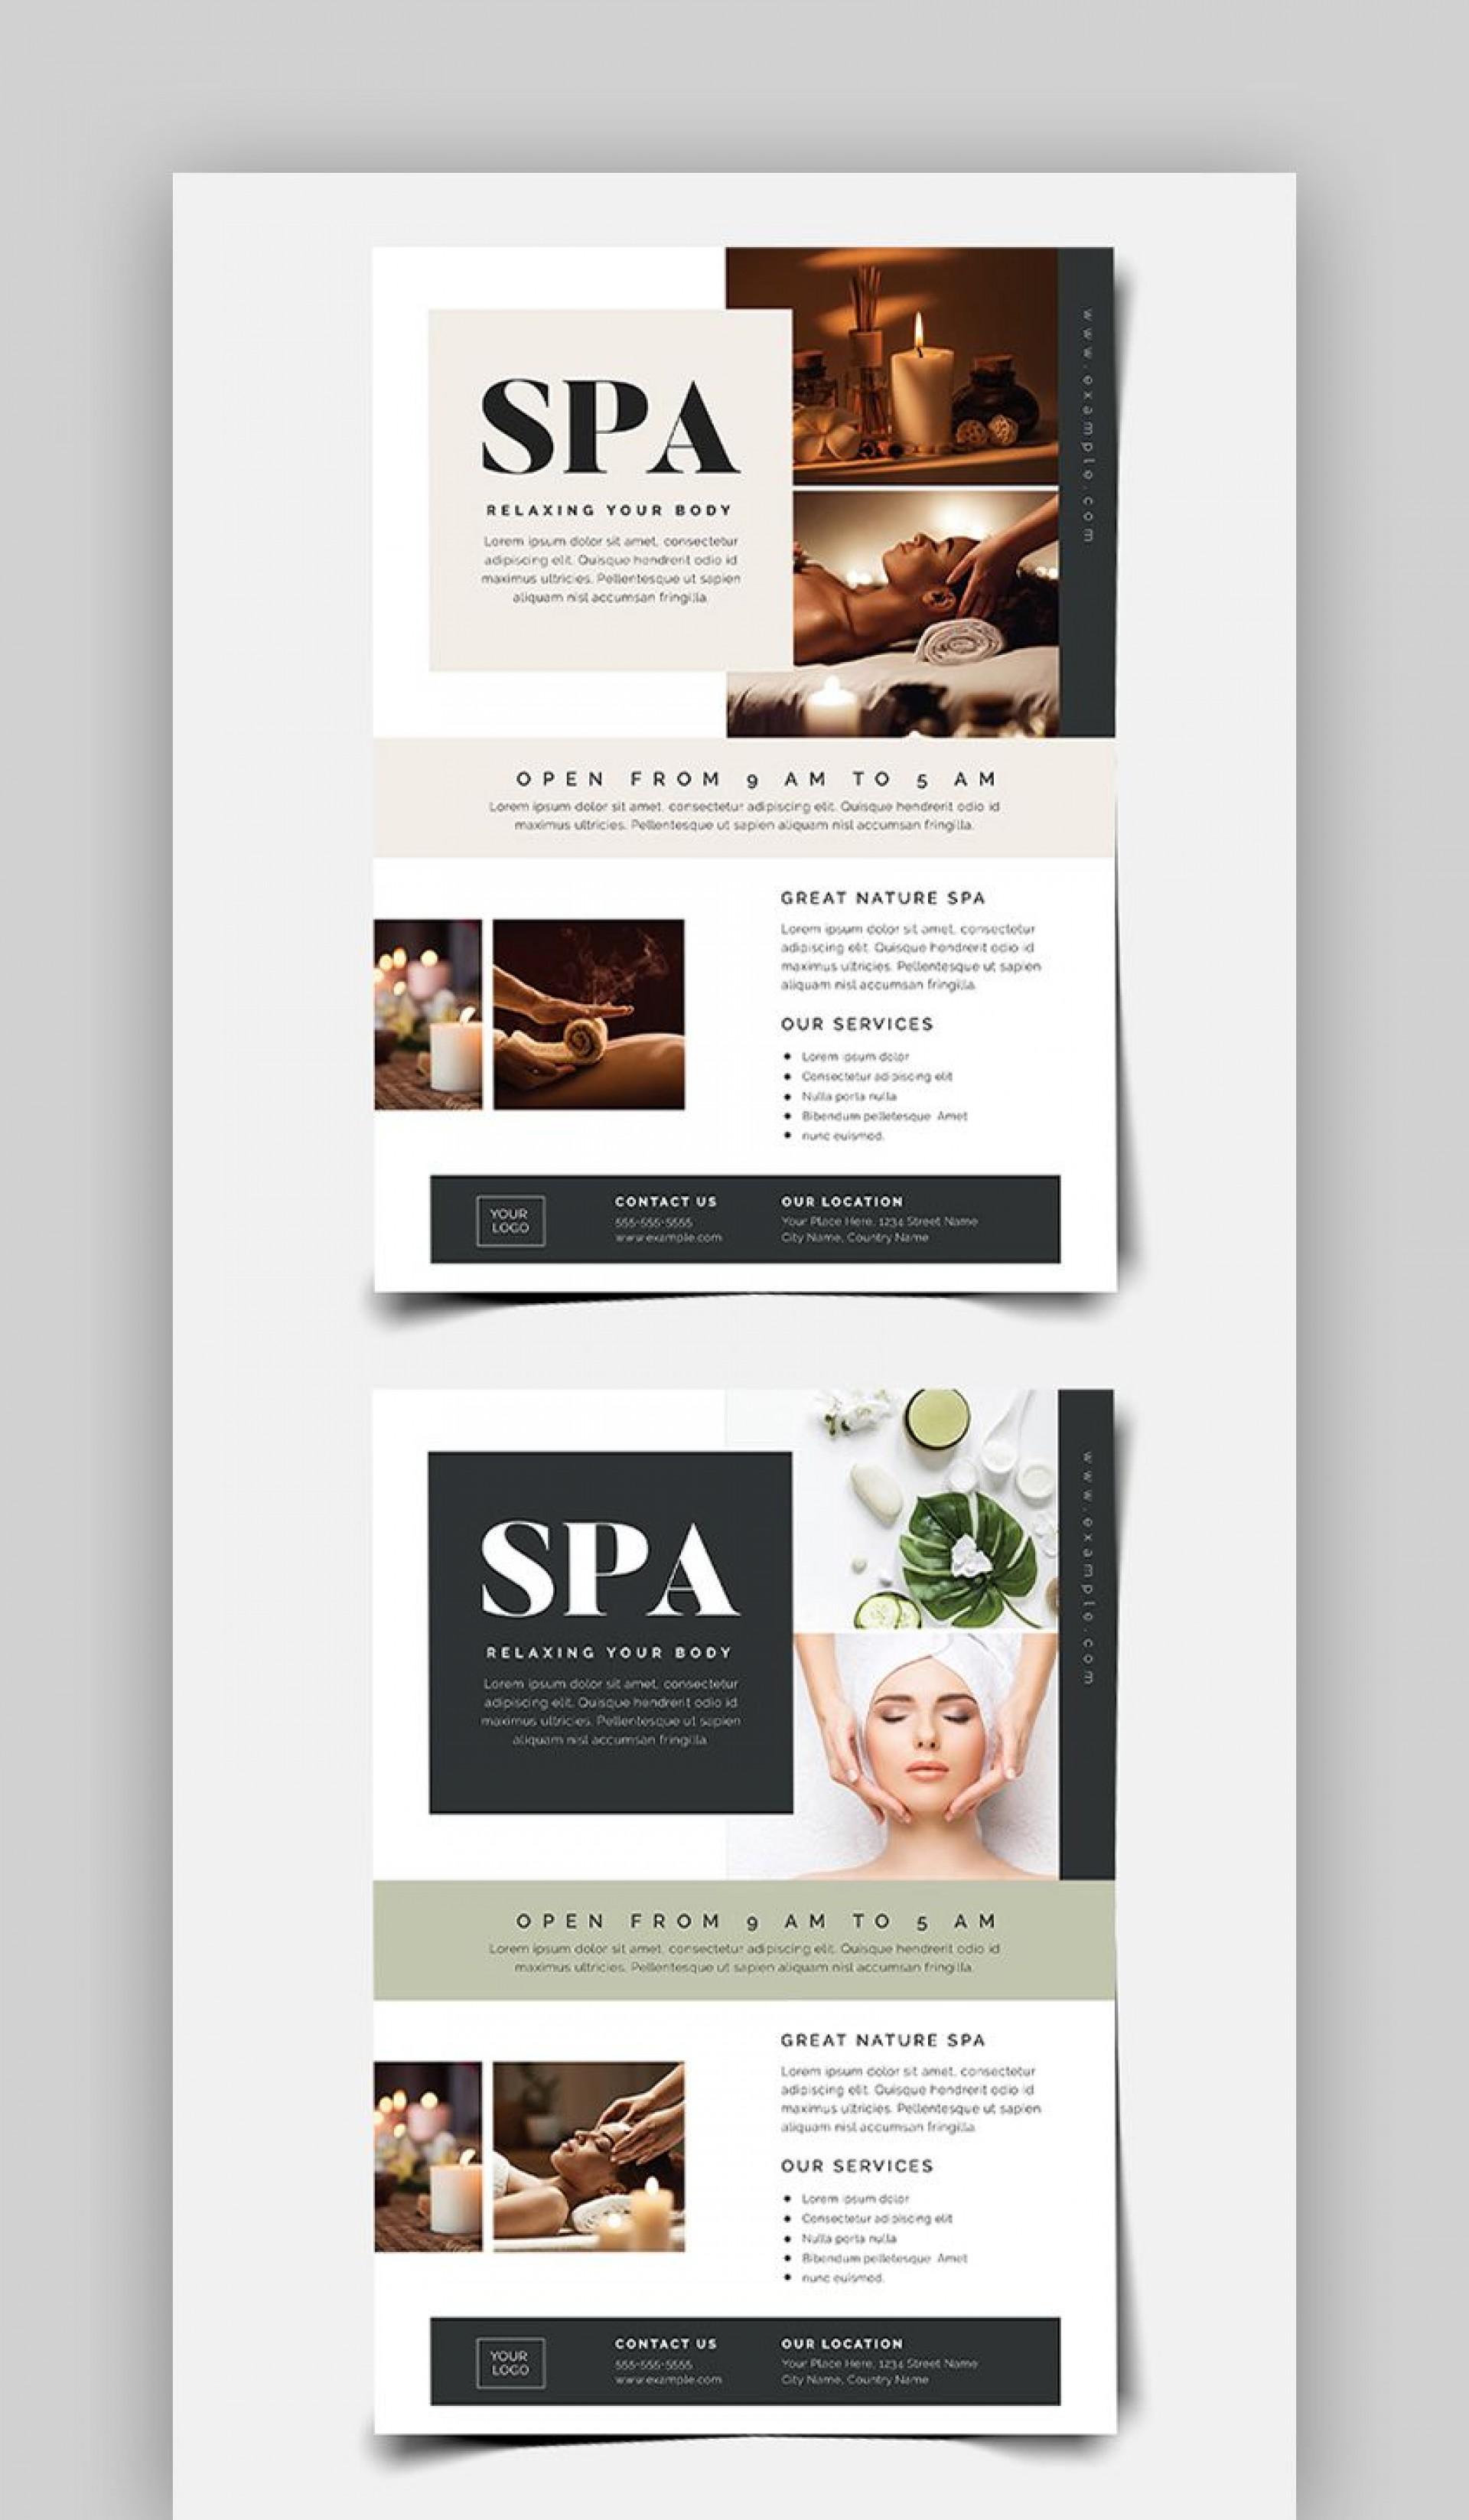 014 Stupendou Free Flyer Design Template Image  Templates Online Download Psd1920